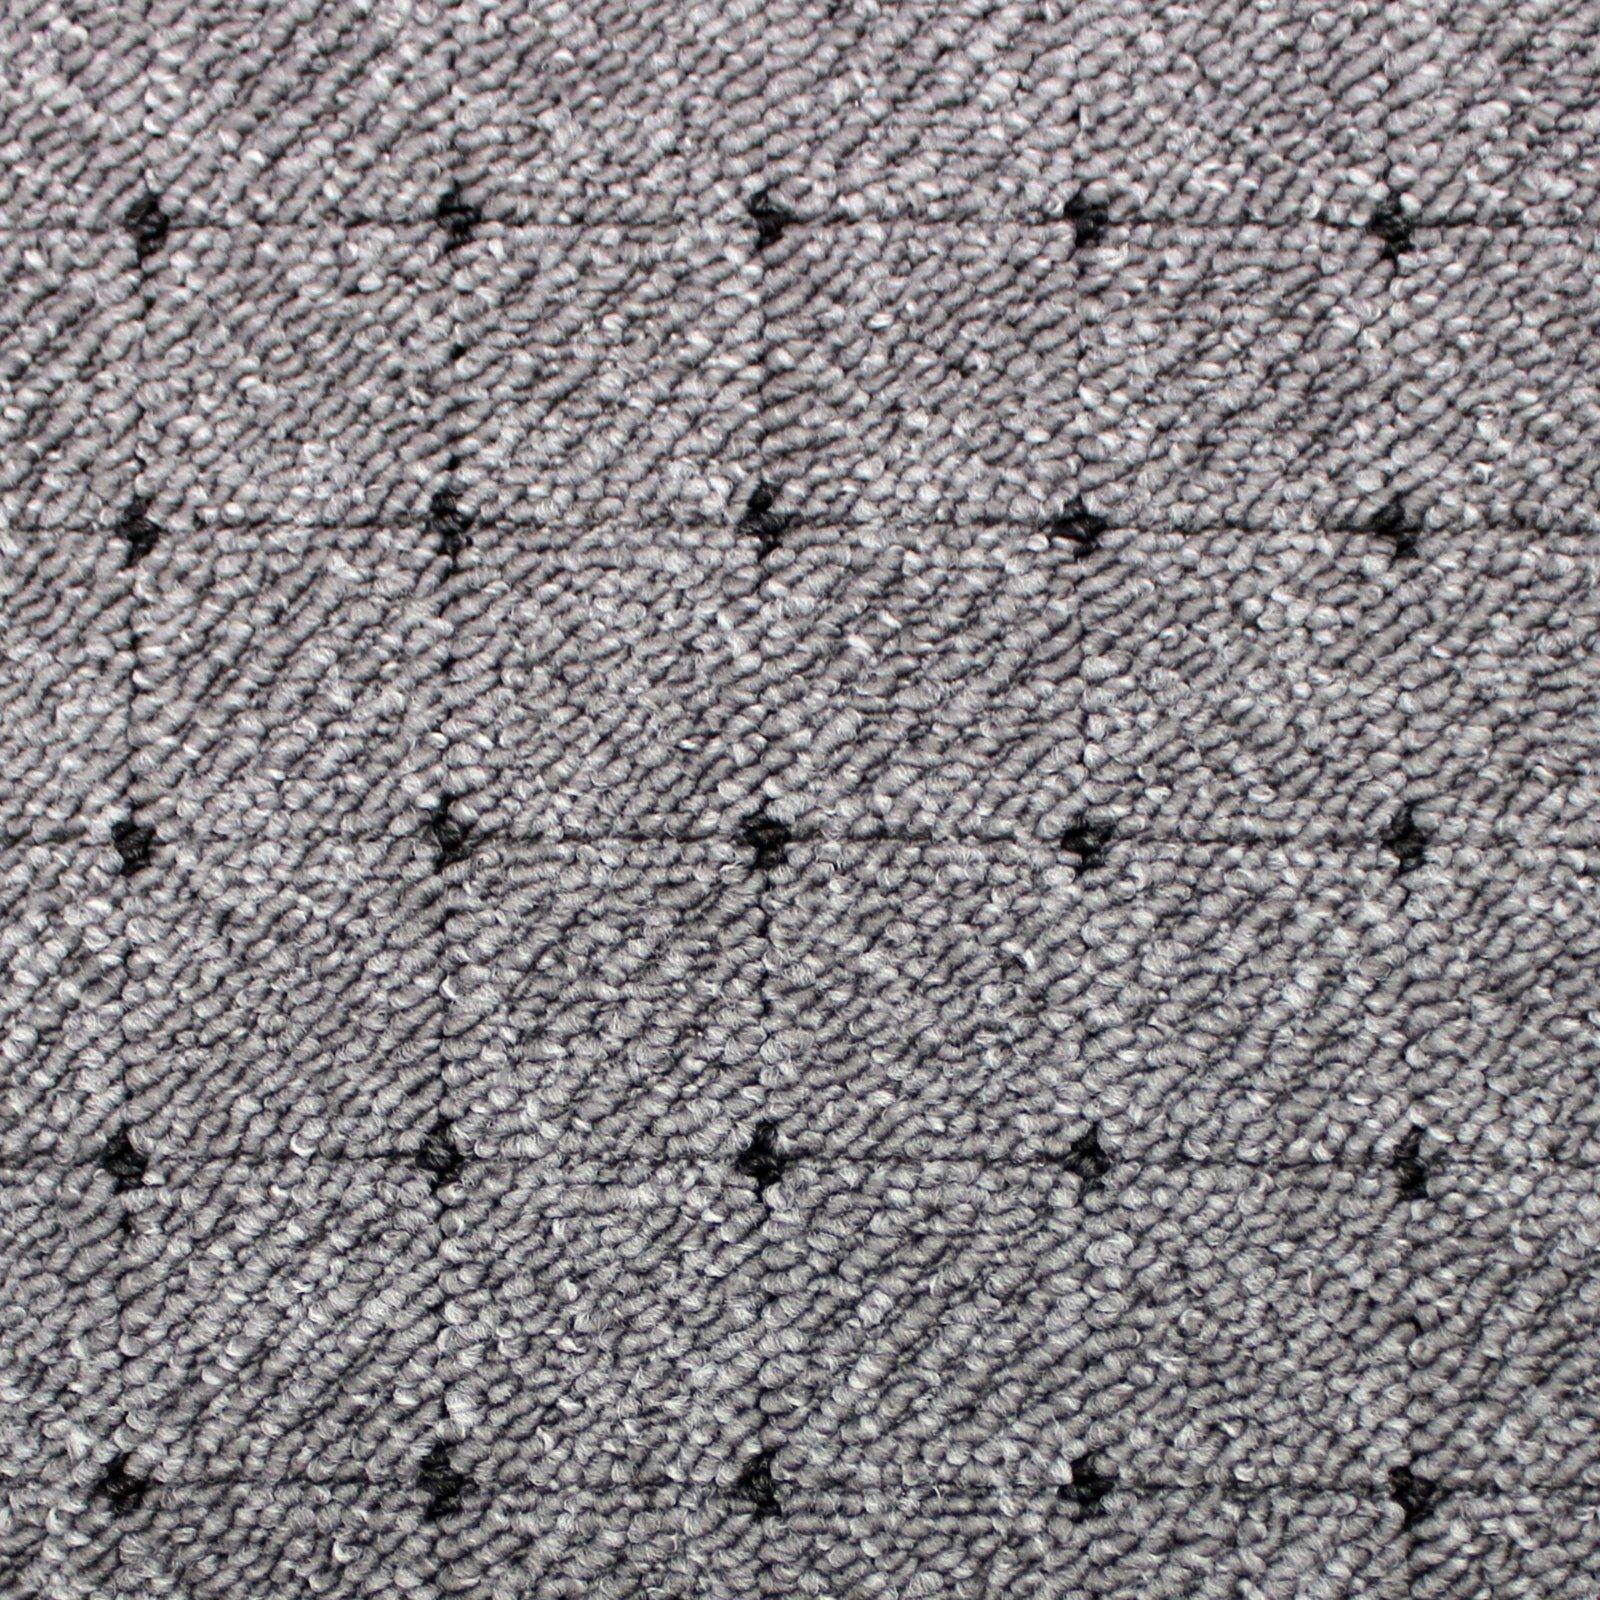 teppichboden aachen grau 5 meter breit teppichboden. Black Bedroom Furniture Sets. Home Design Ideas